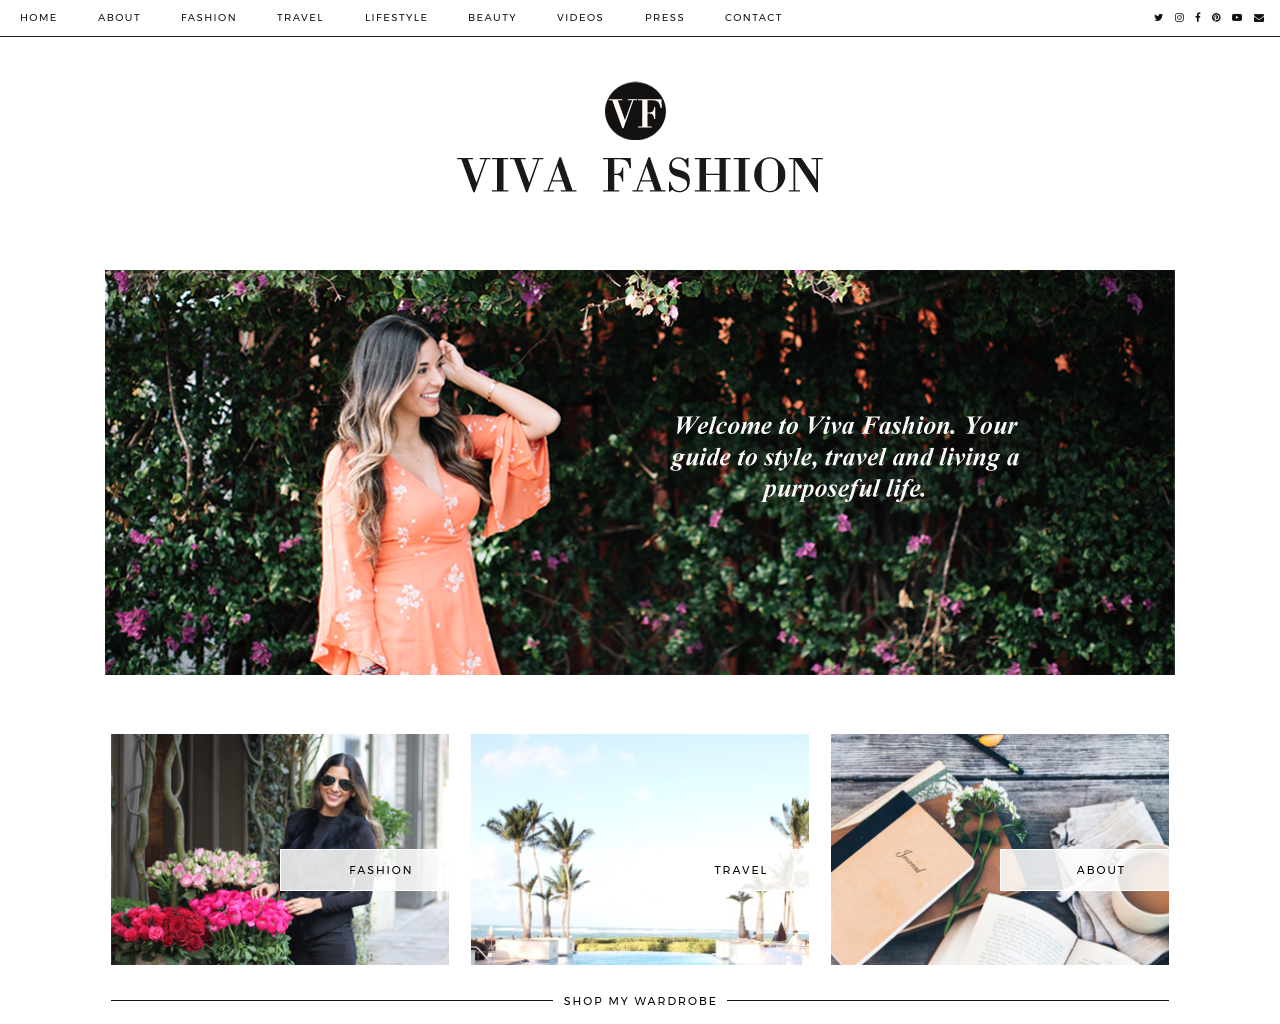 Viva-Fashion-Advertising-Reviews-Pricing